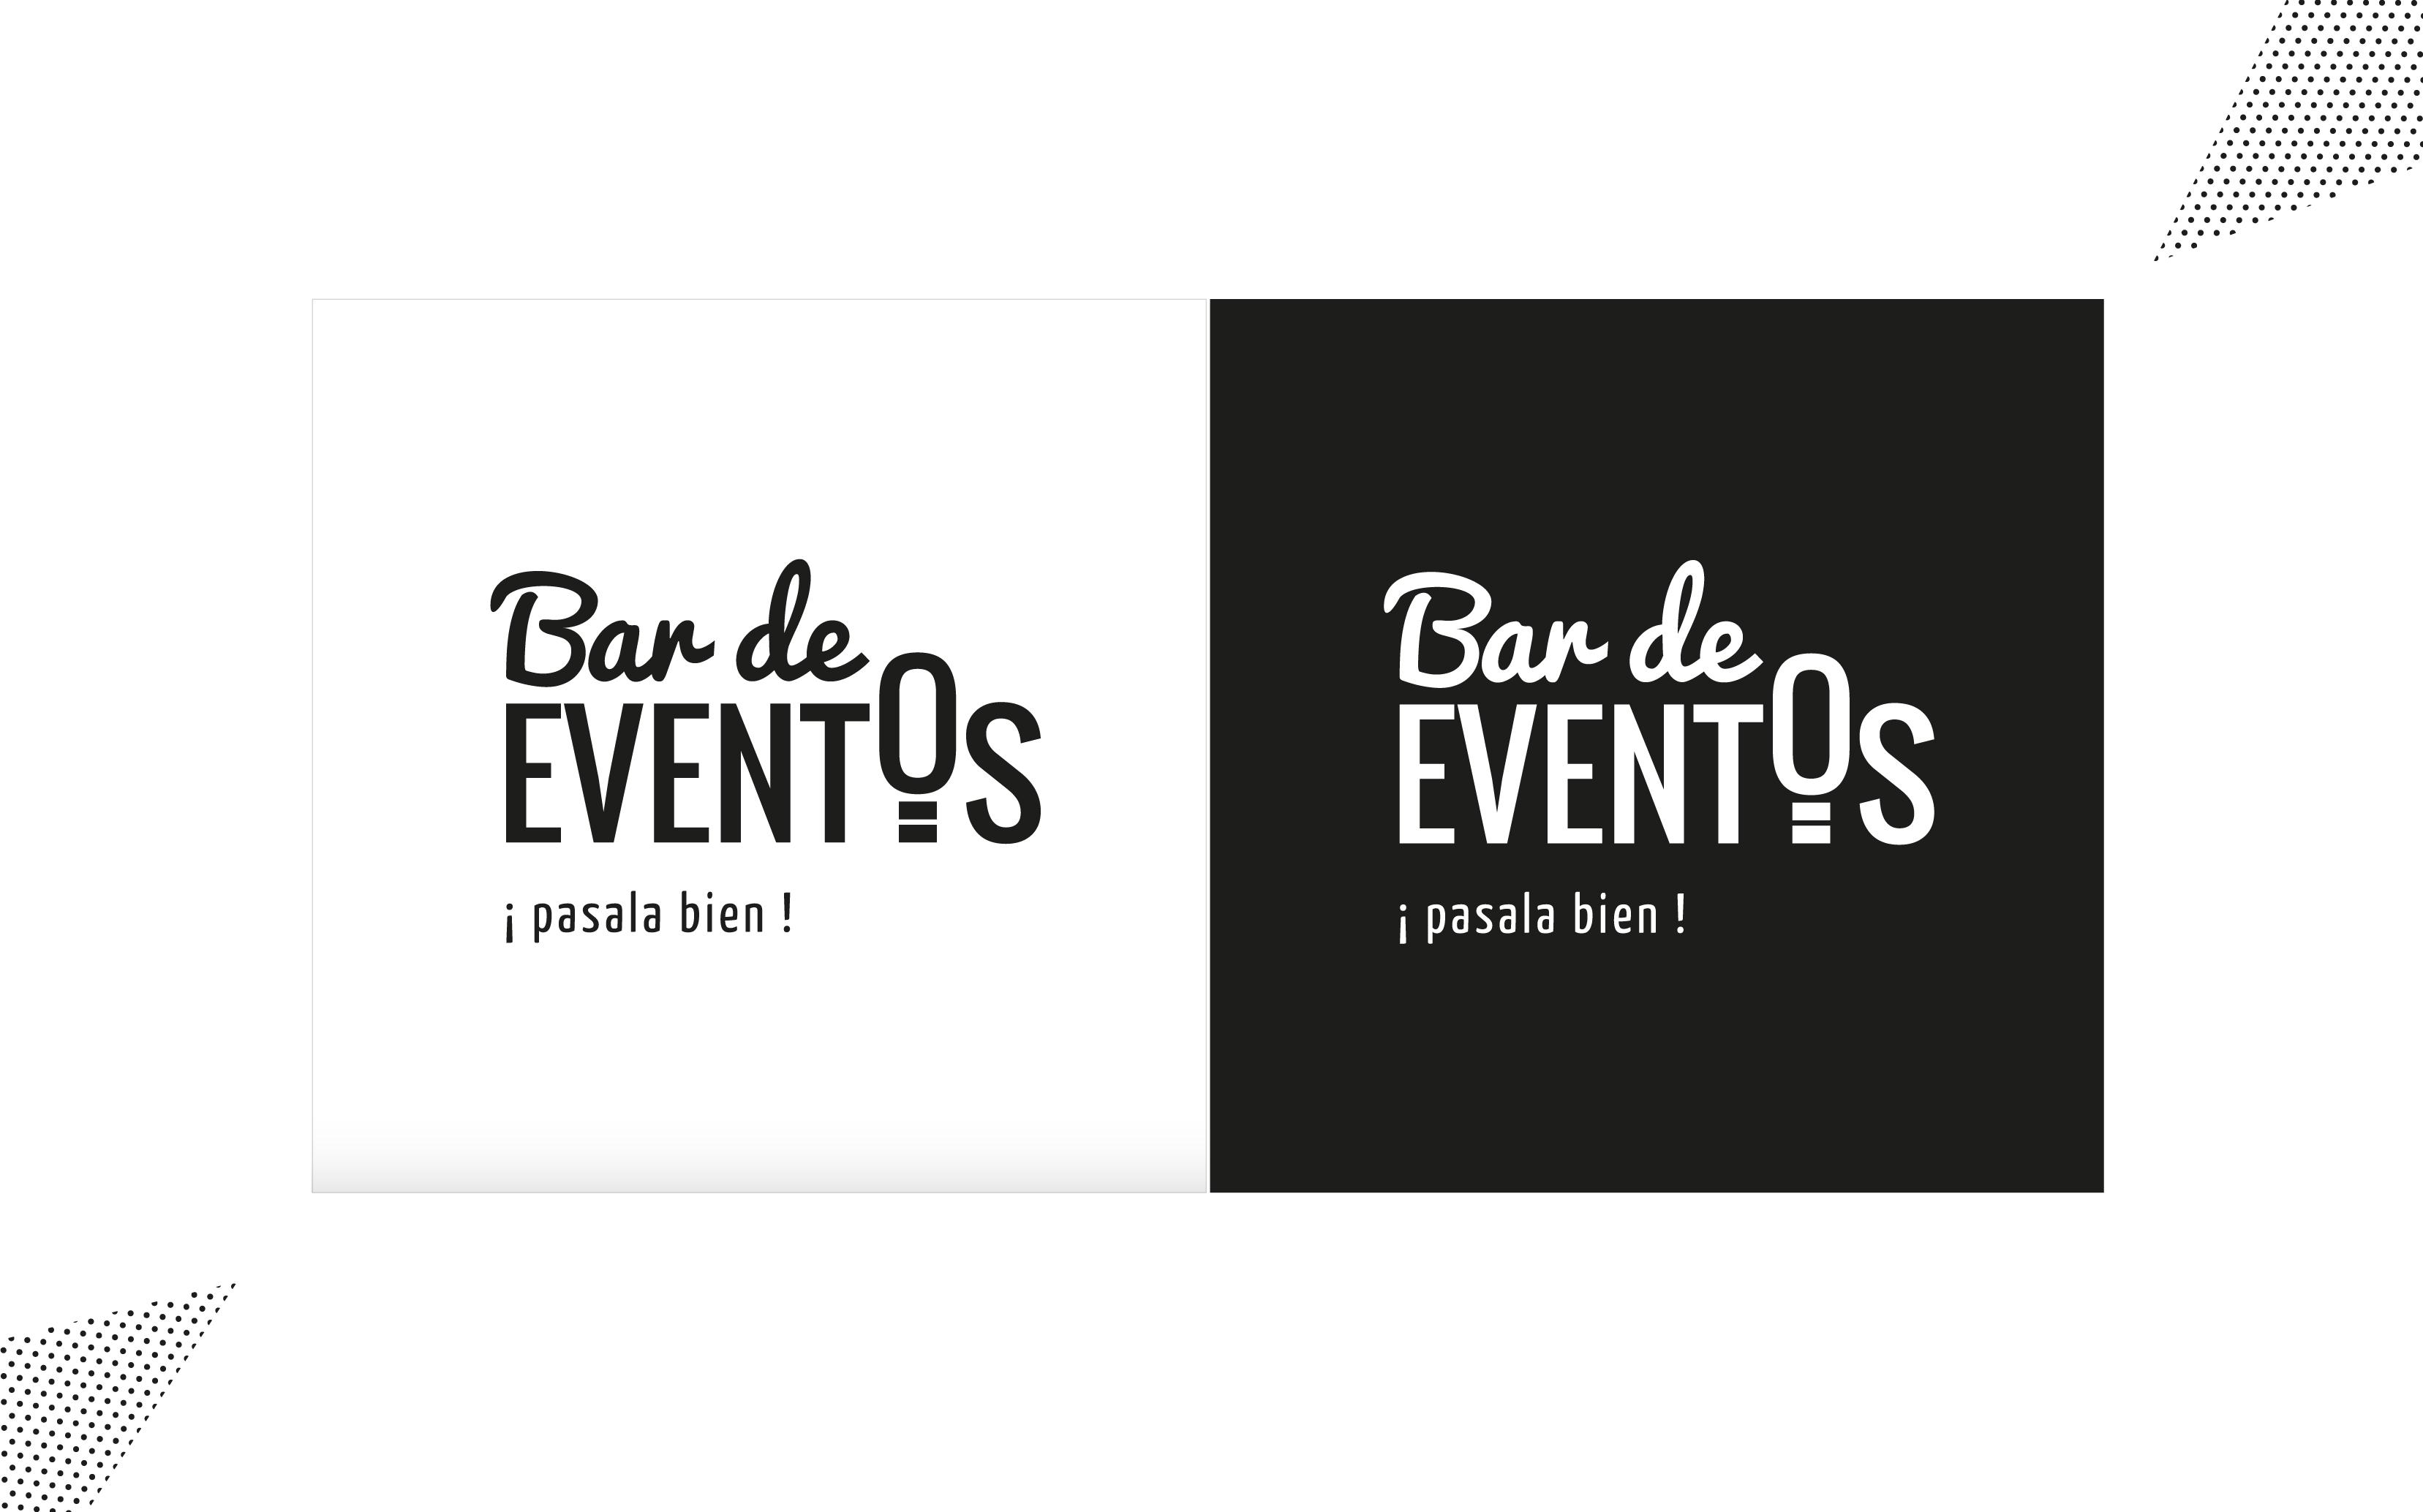 Diseño de marca Bar de Eventos